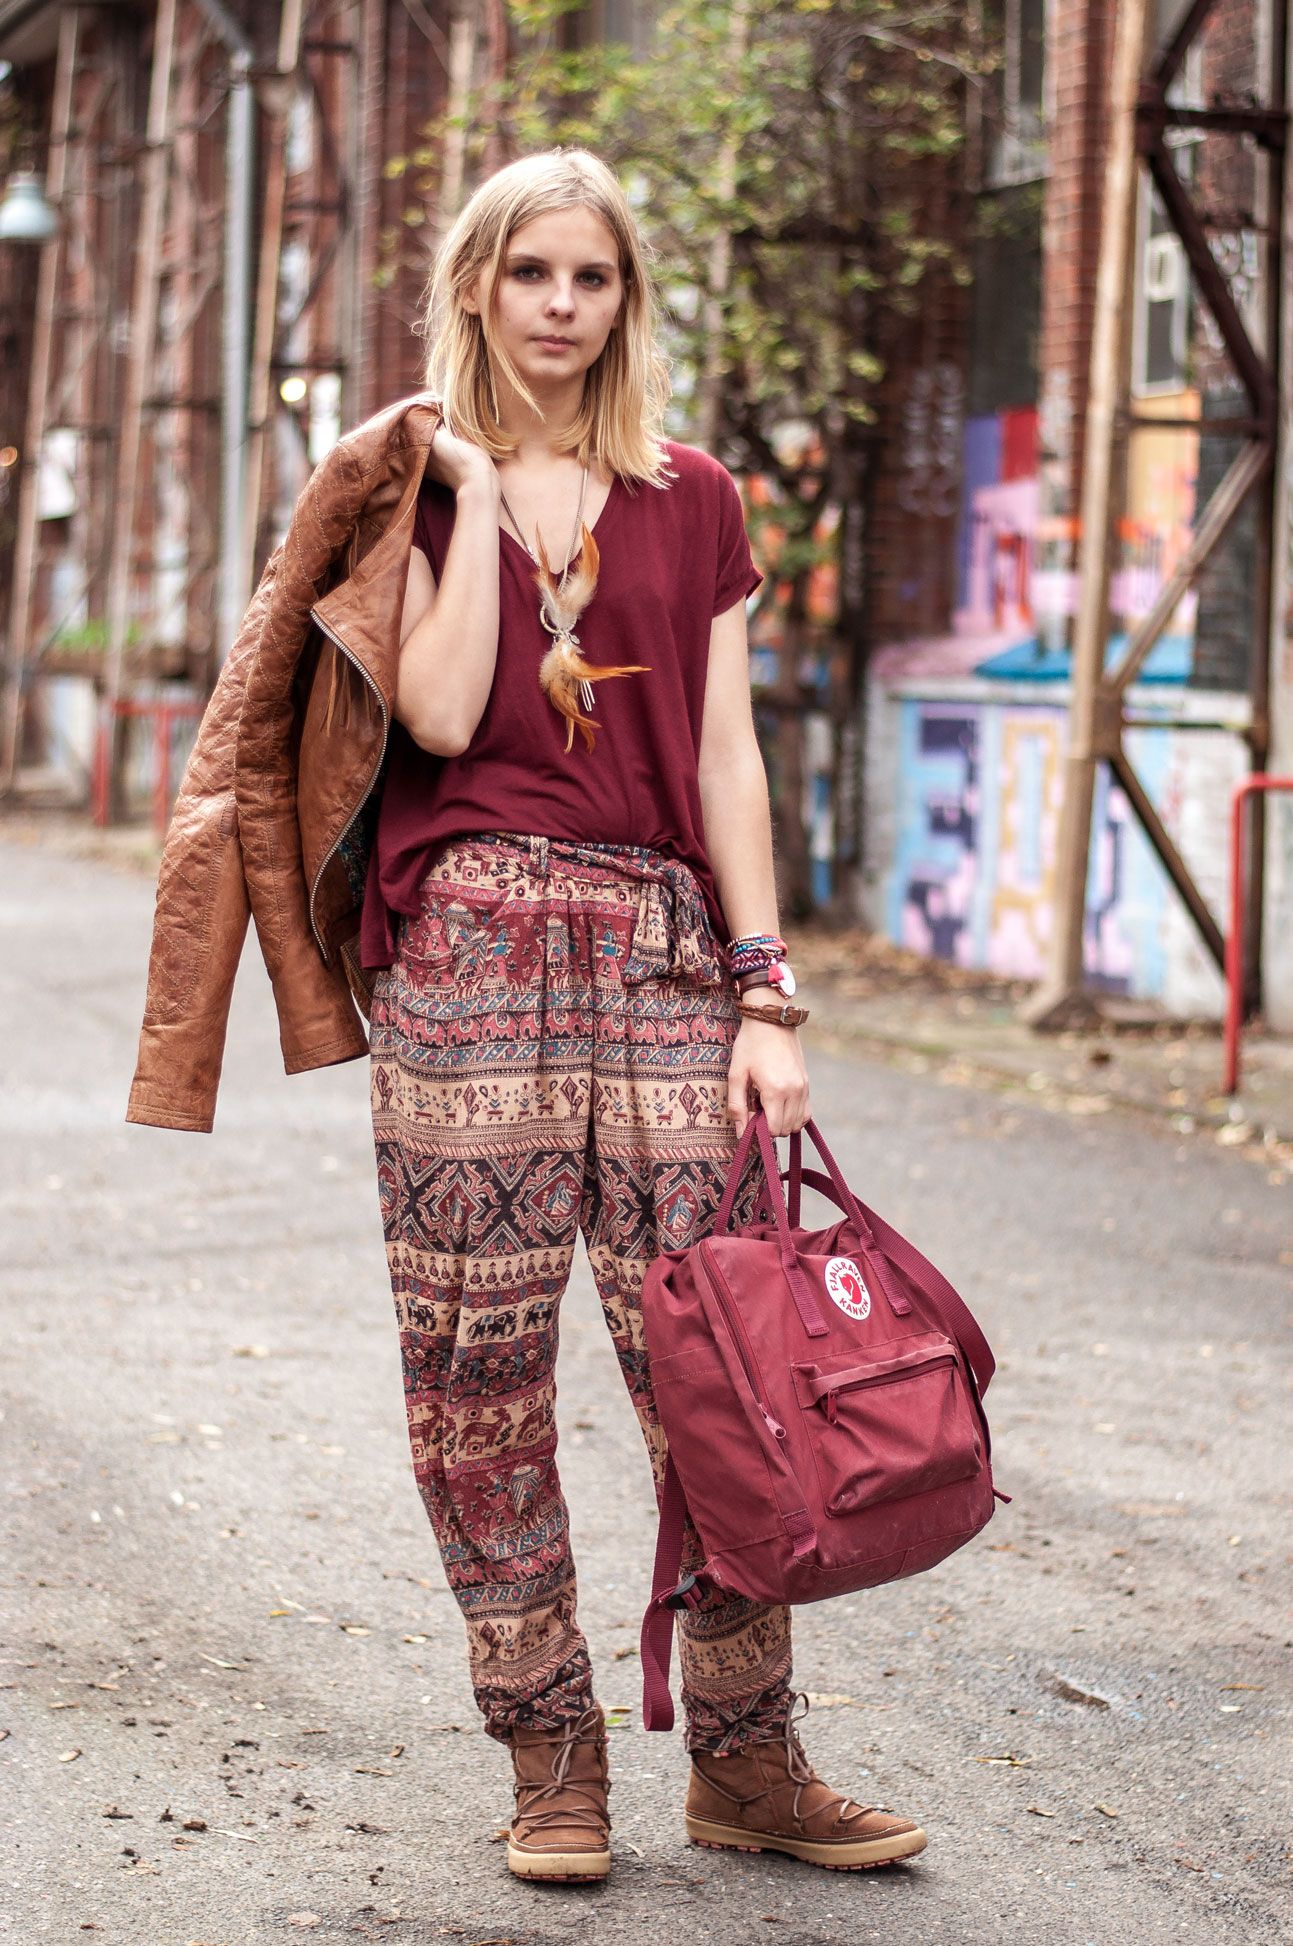 autumn boho style fjällräven backpack in burgundy wide boho